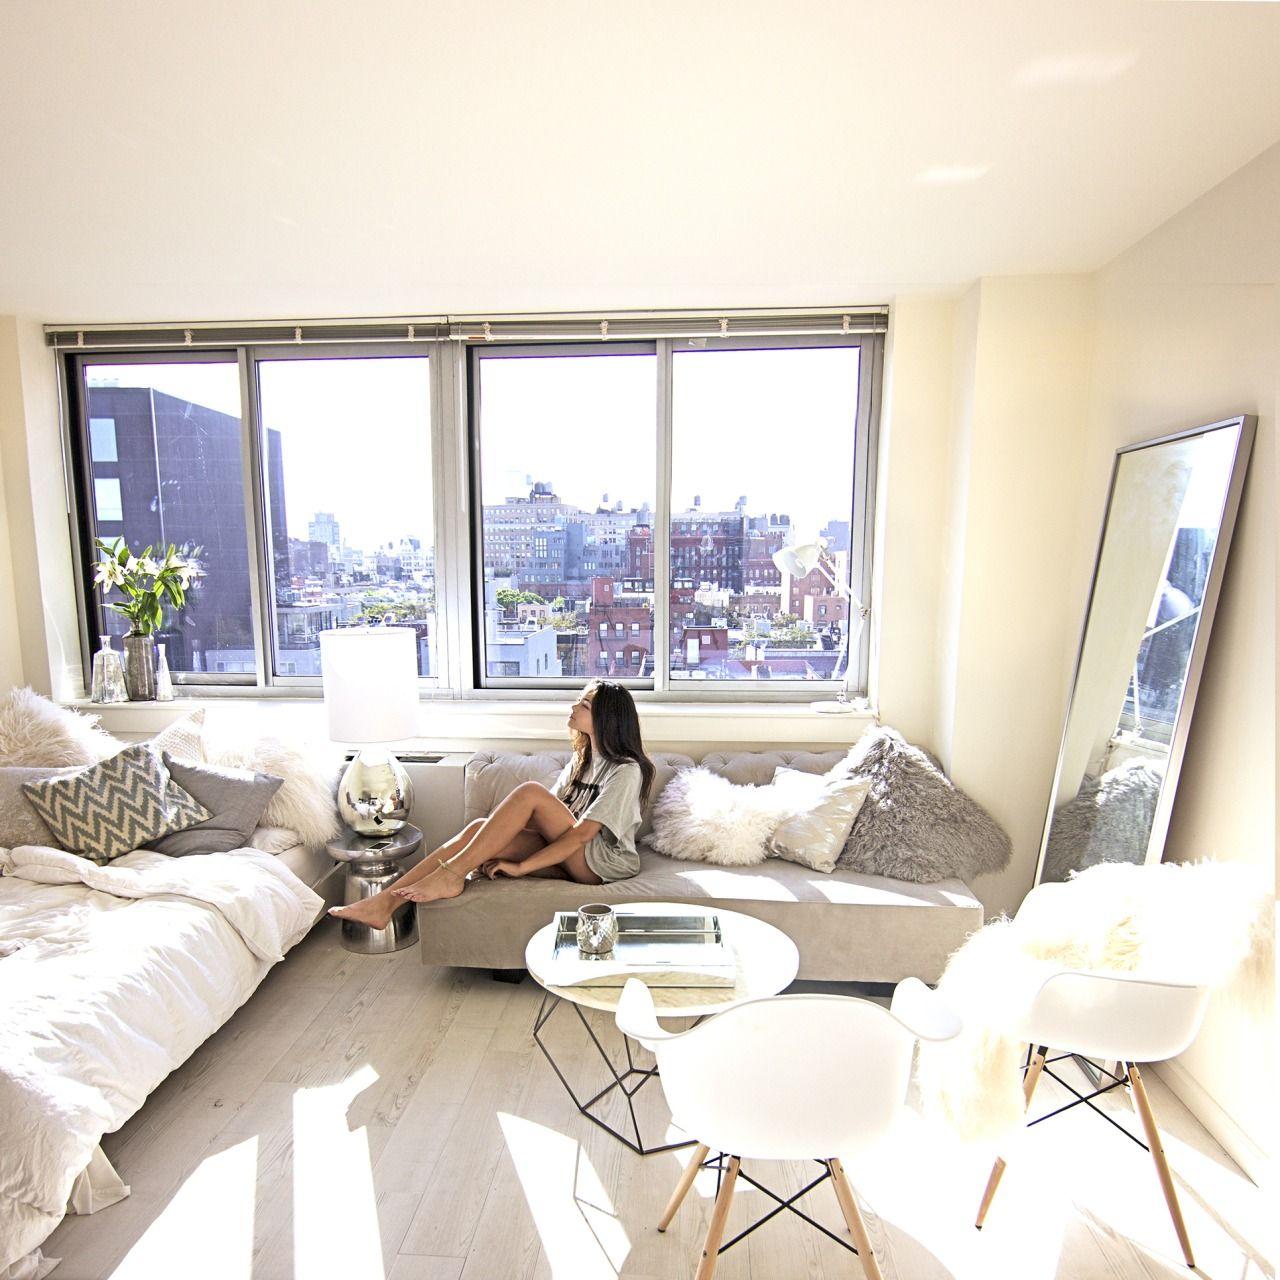 C l a s s y in the city | Studio apartment decorating, Apartment decor, Apartment interior